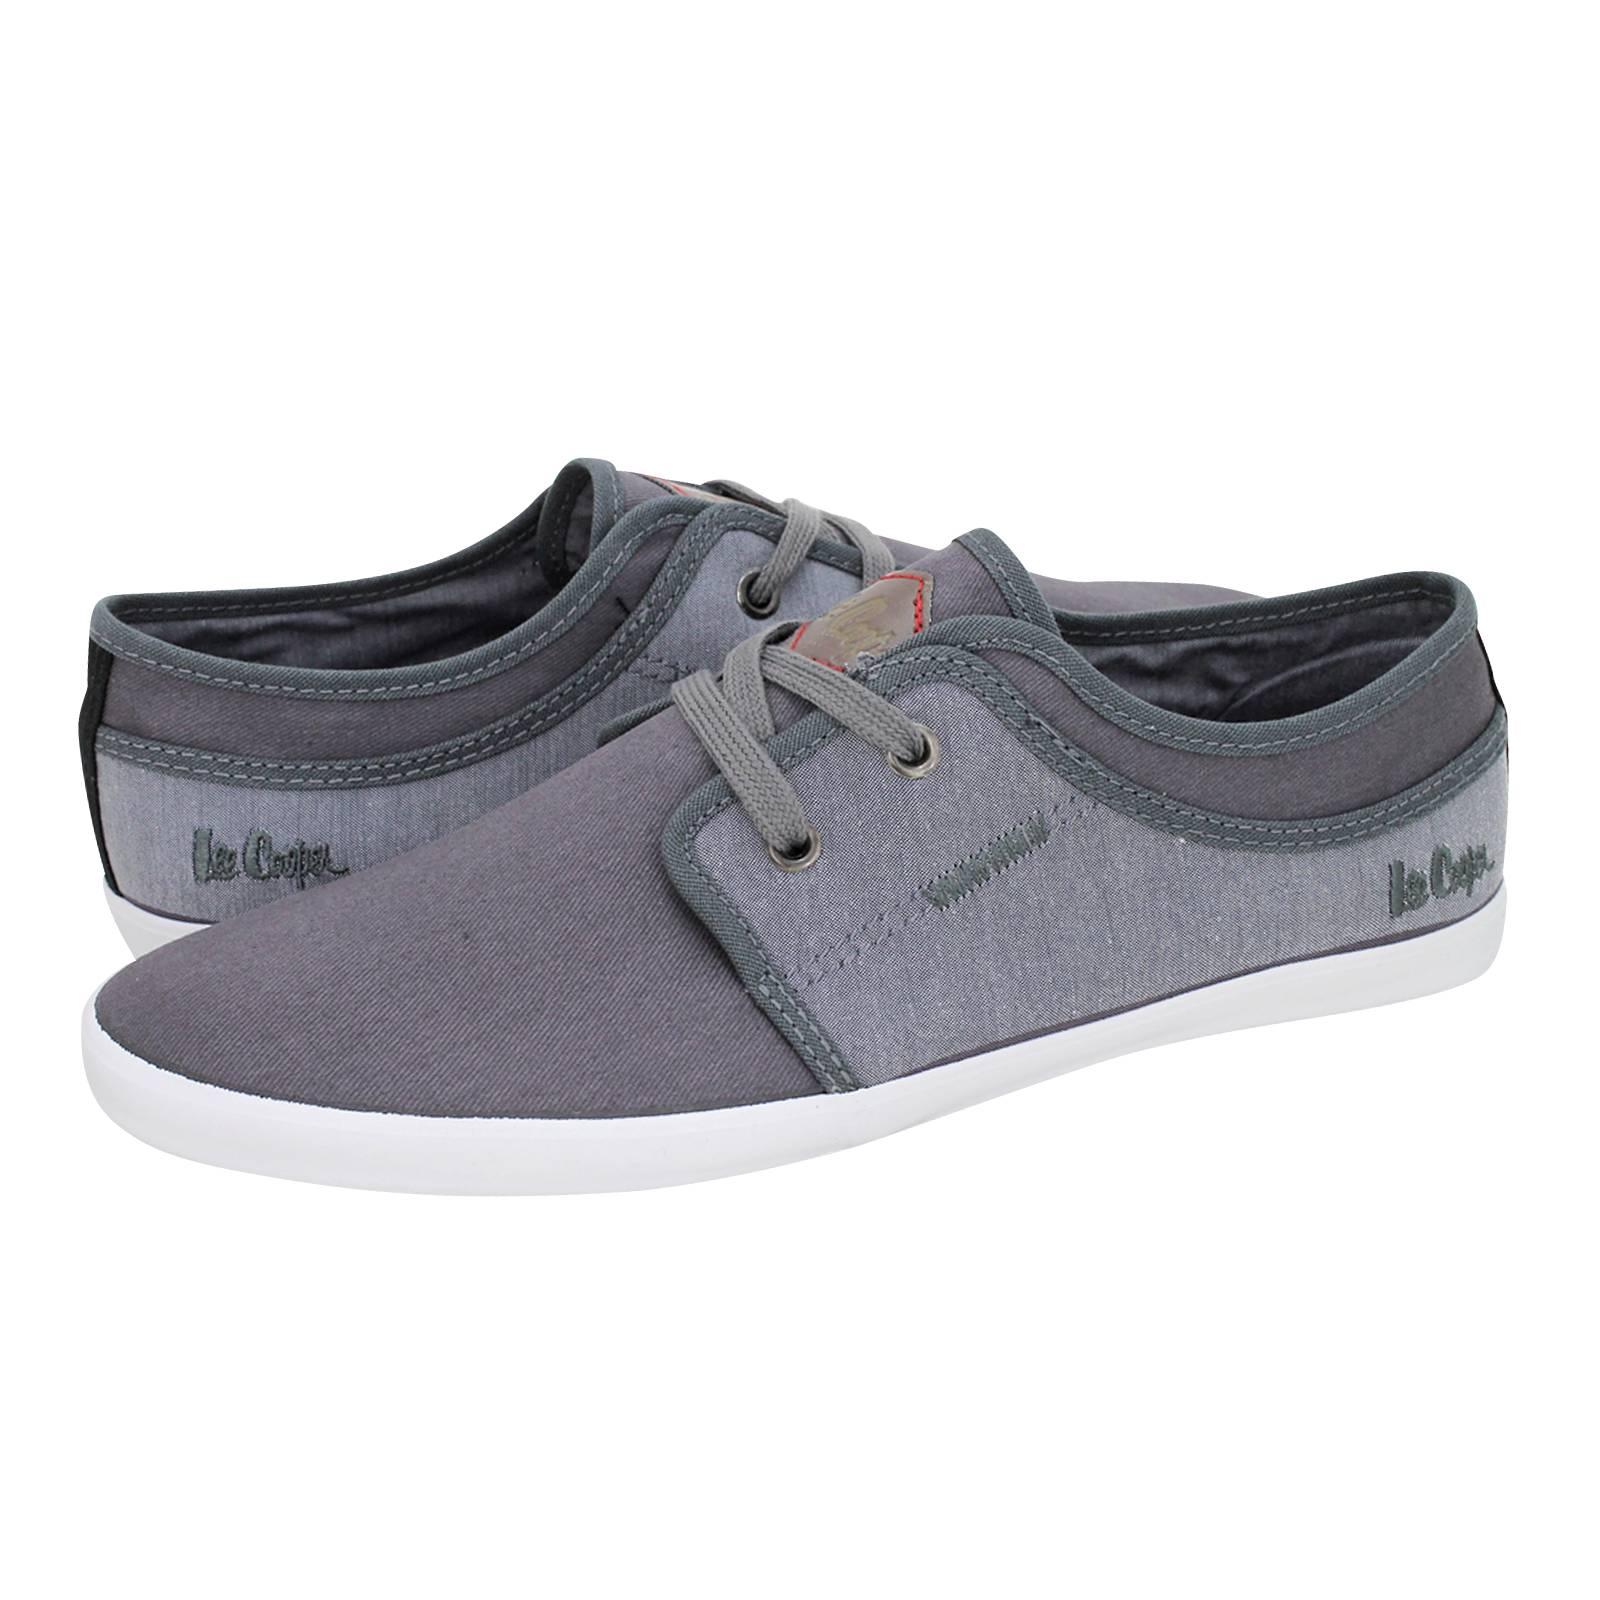 Chanton - Lee Cooper Men's casual shoes